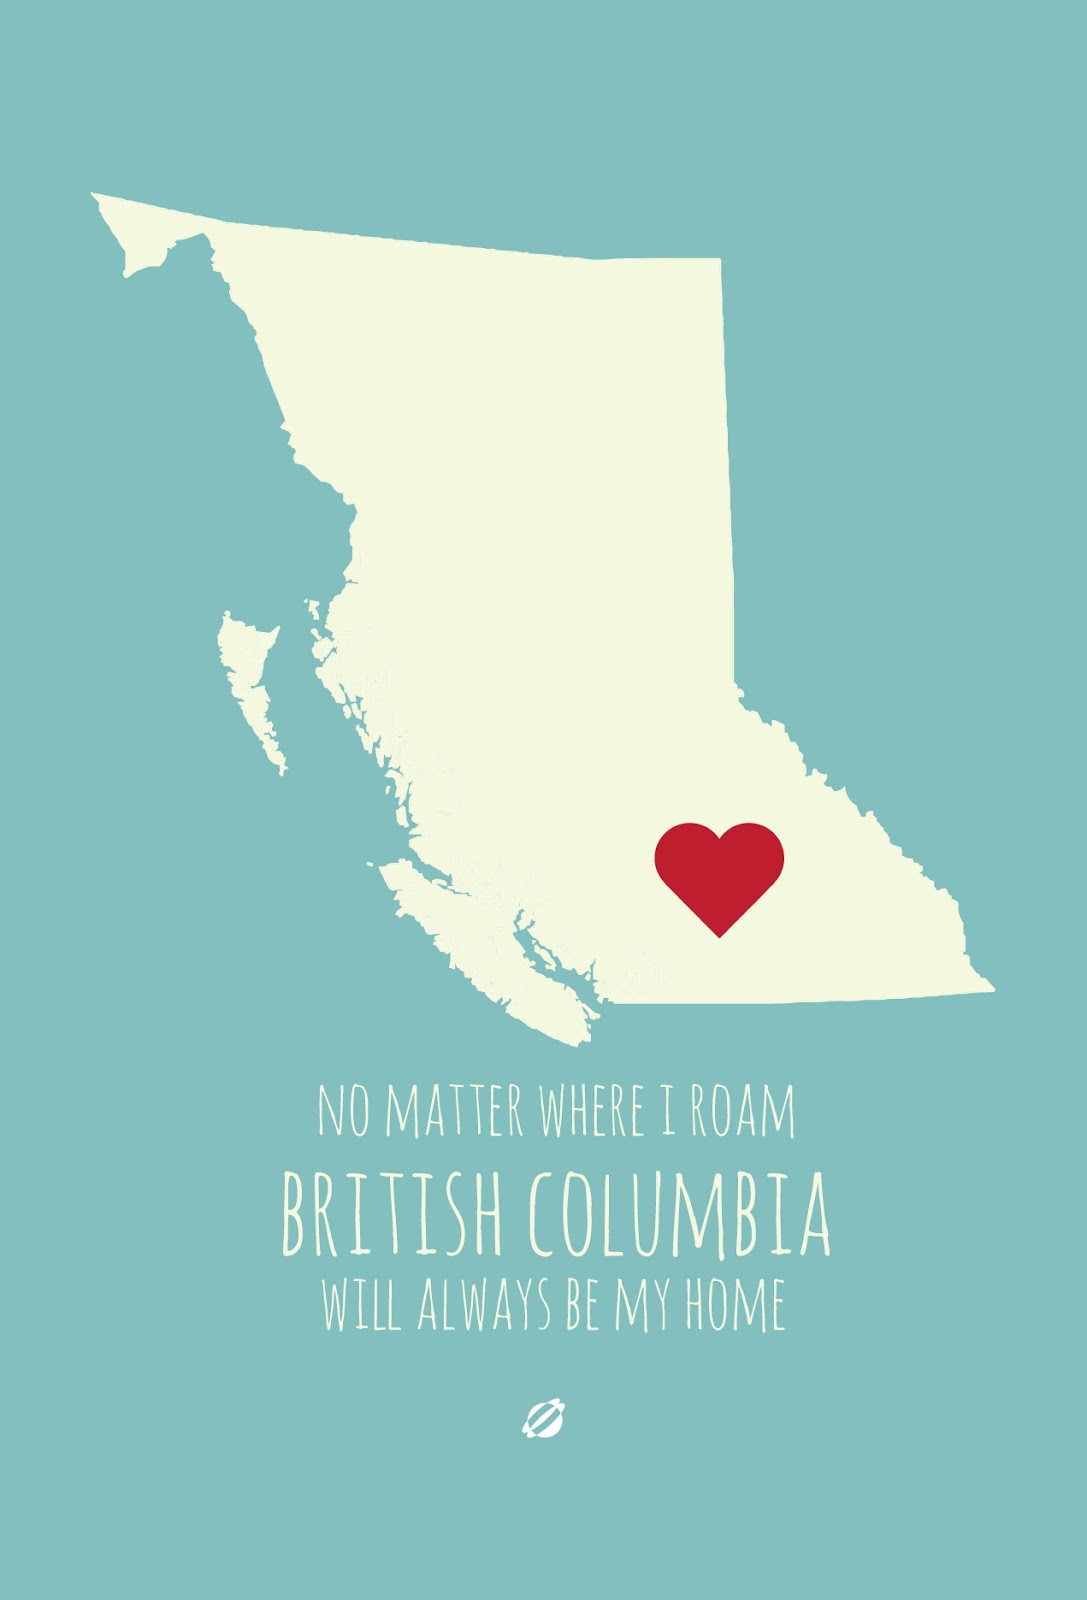 LostBumblebee 2013 British Columbia